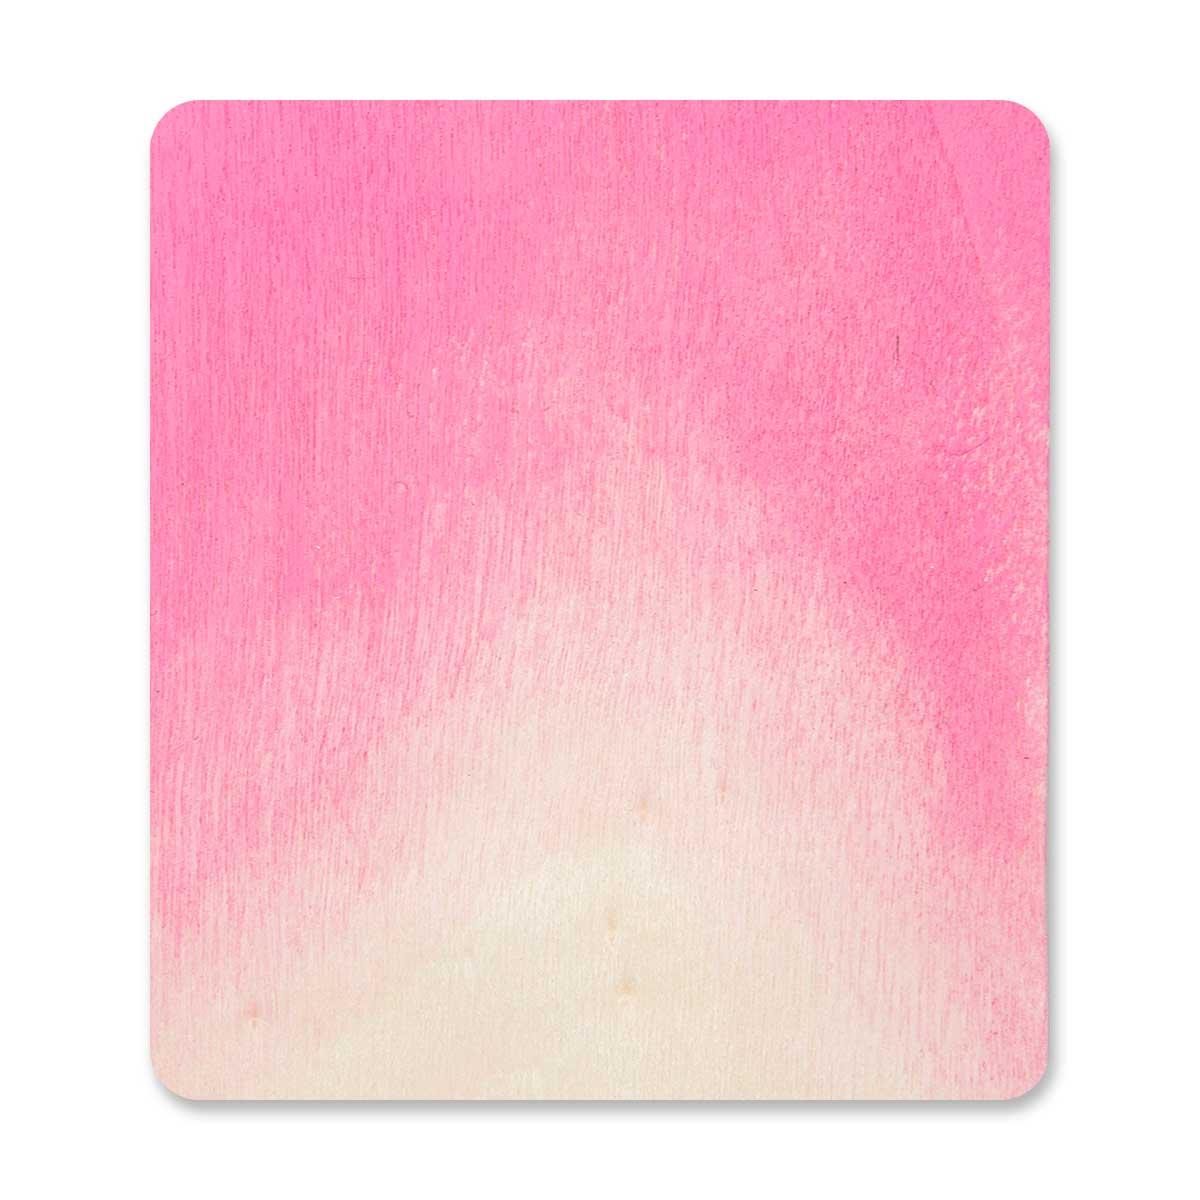 FolkArt ® Watercolor Acrylic Paint™ - Pink, 2 oz.